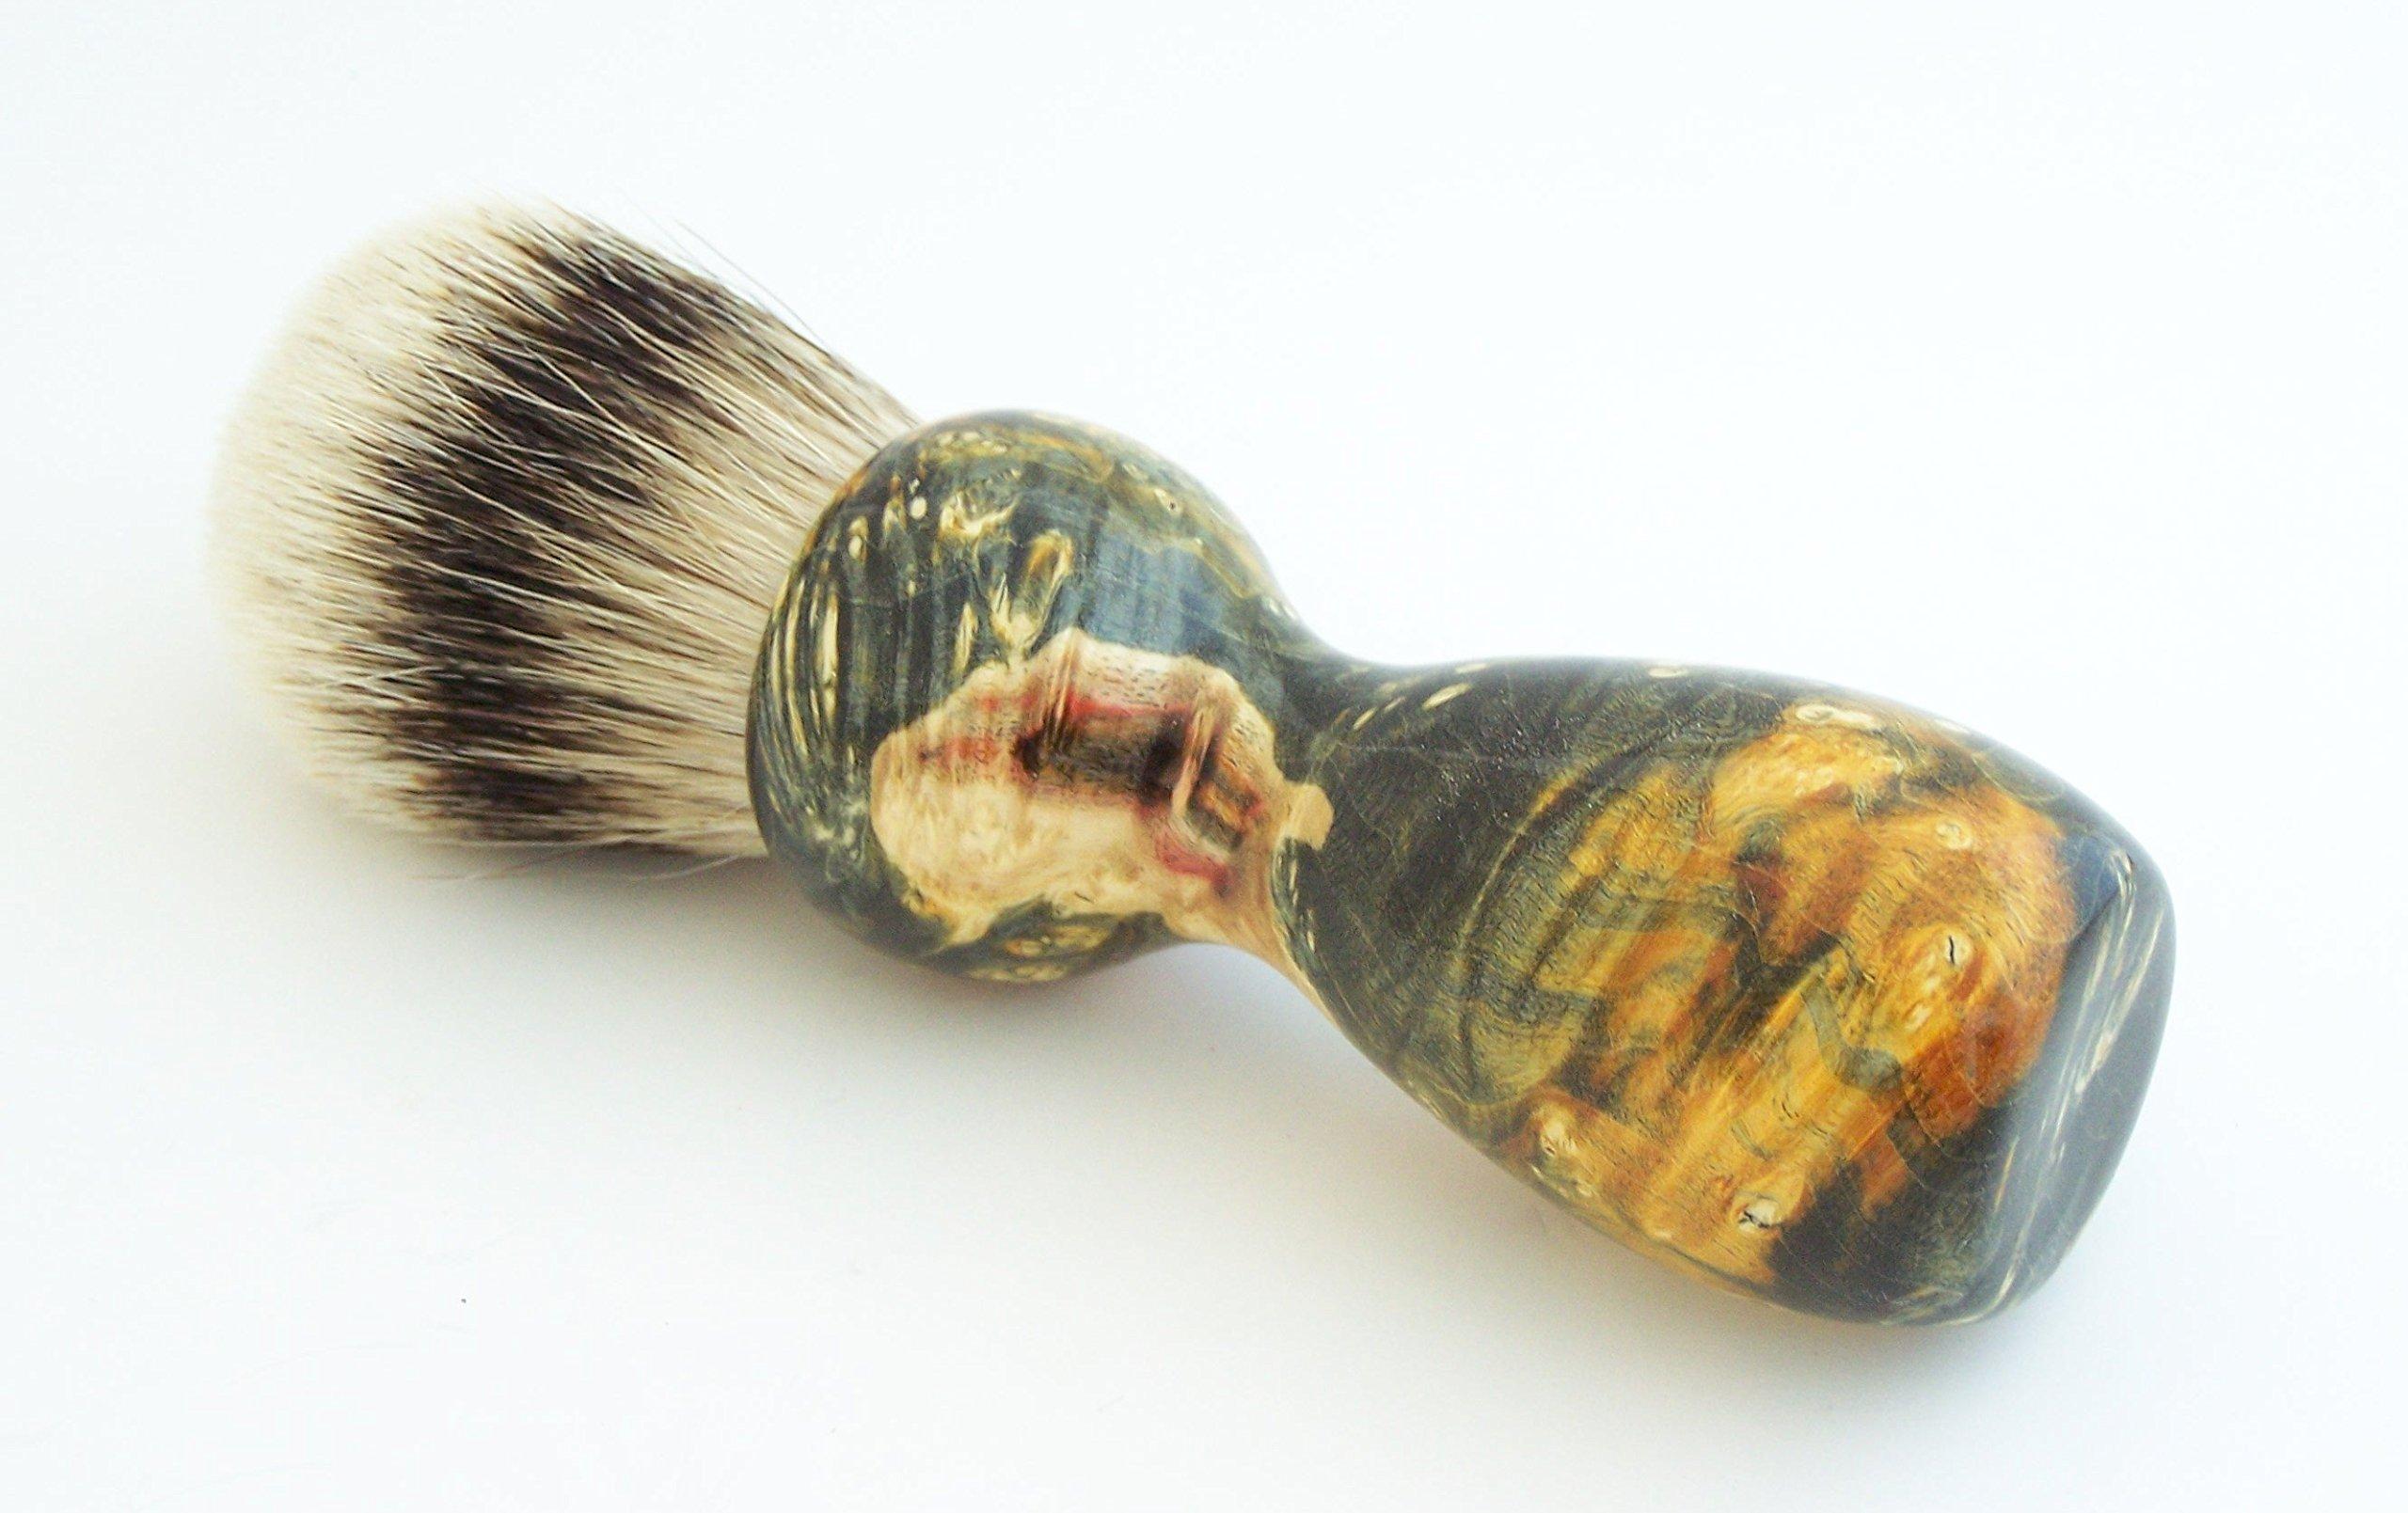 Gold and Black Box Elder Burl Wood 24mm Super Silvertip Shaving Brush (BEB40)